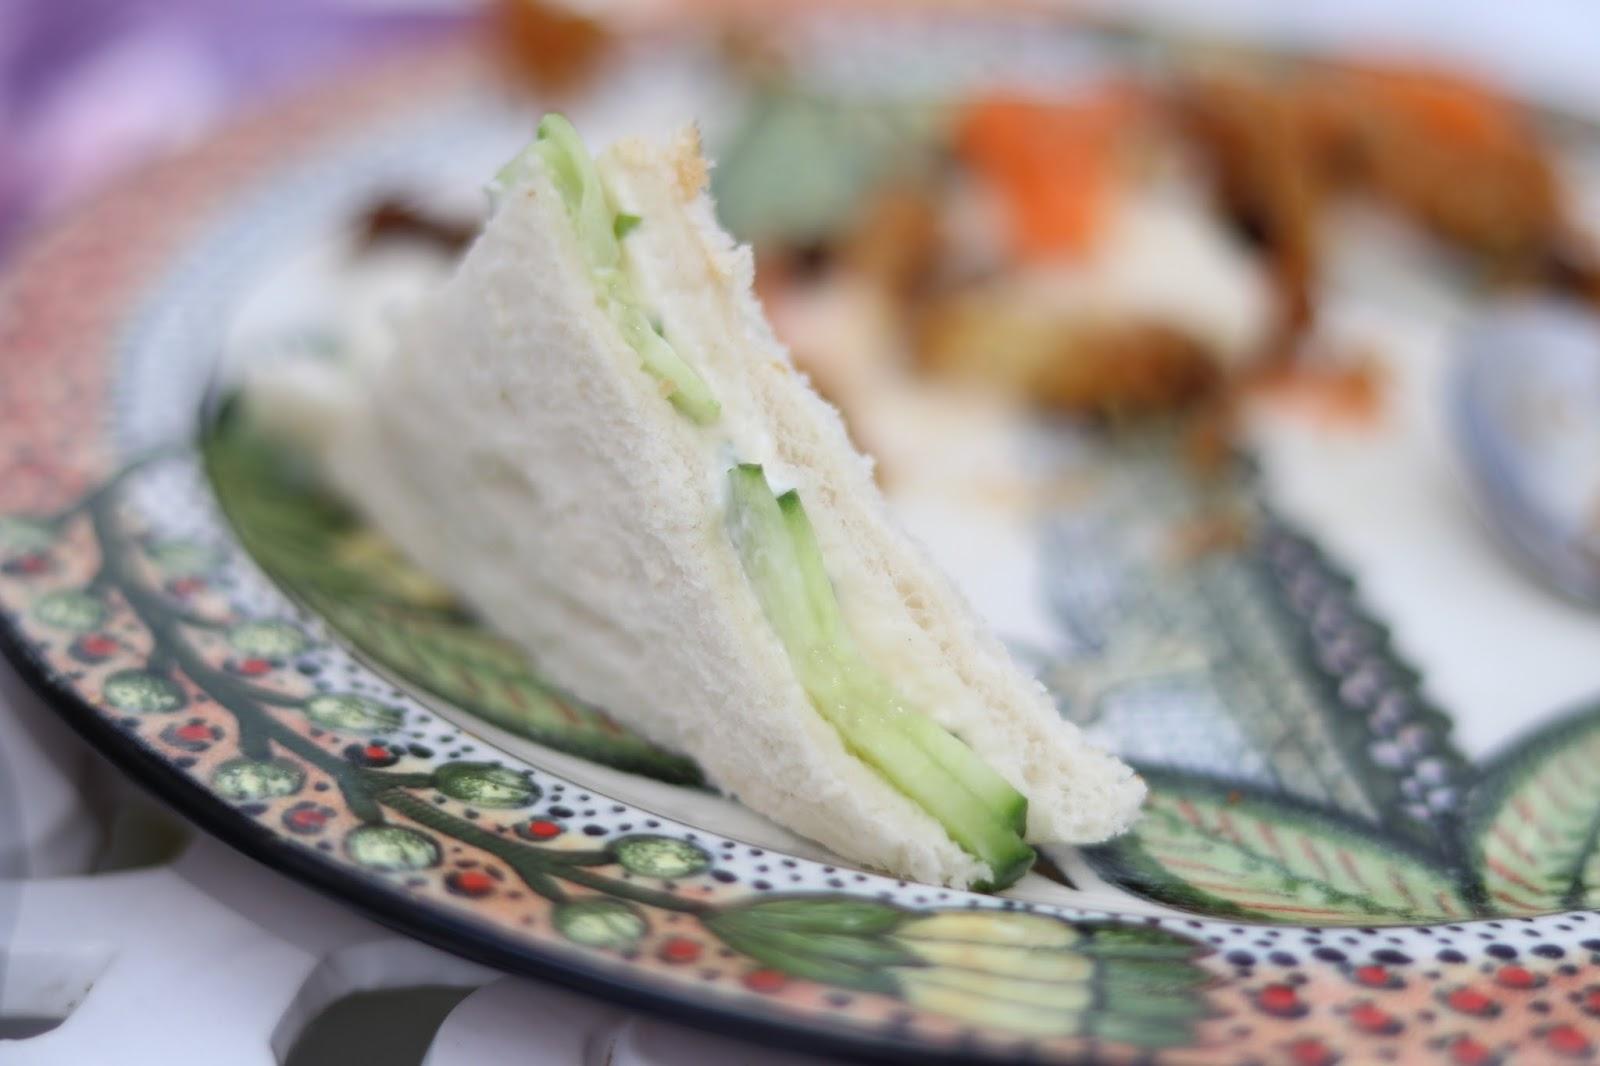 Cucumber sandwich at Ardmore Ceramics, South Africa